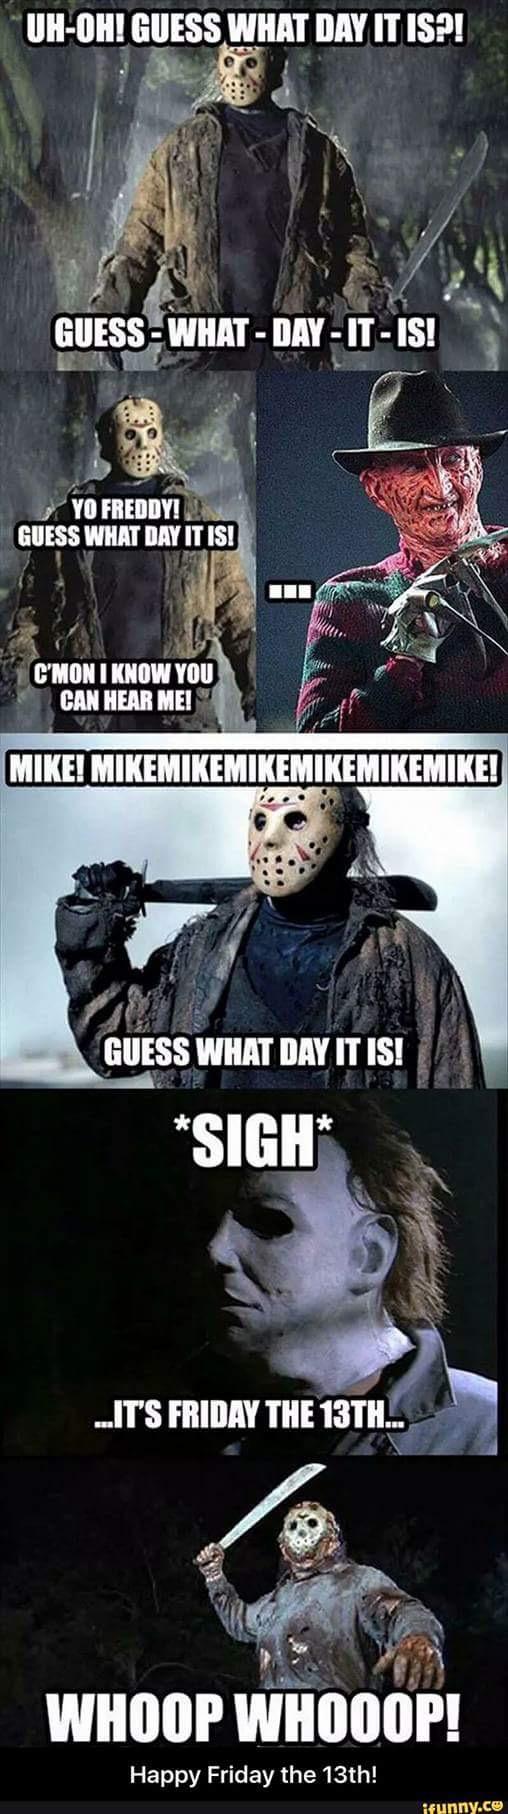 Silly Friday the 13th meme haha Jason Freddy and Michael